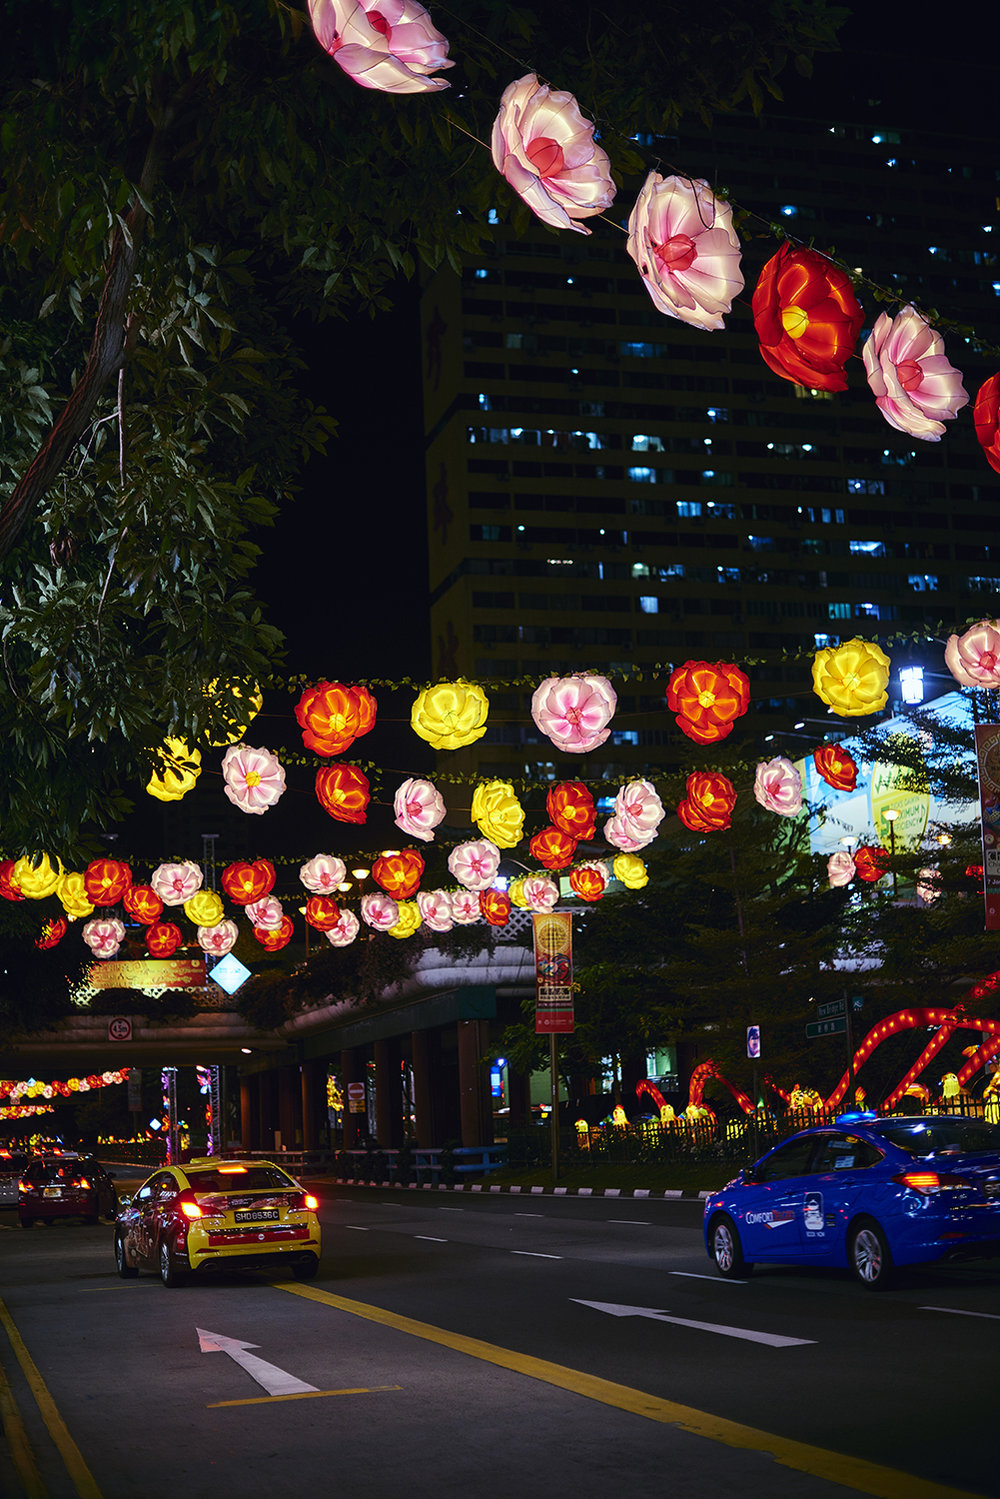 Street Light Up - PHOTOGRAPHY :  LIKHITHA (ANYA) MURALIKRISHNA  - NIKON D810  - NIKKOR 50  MM F/1  .4  @  F/1.4 - 1/125   - ISO 250